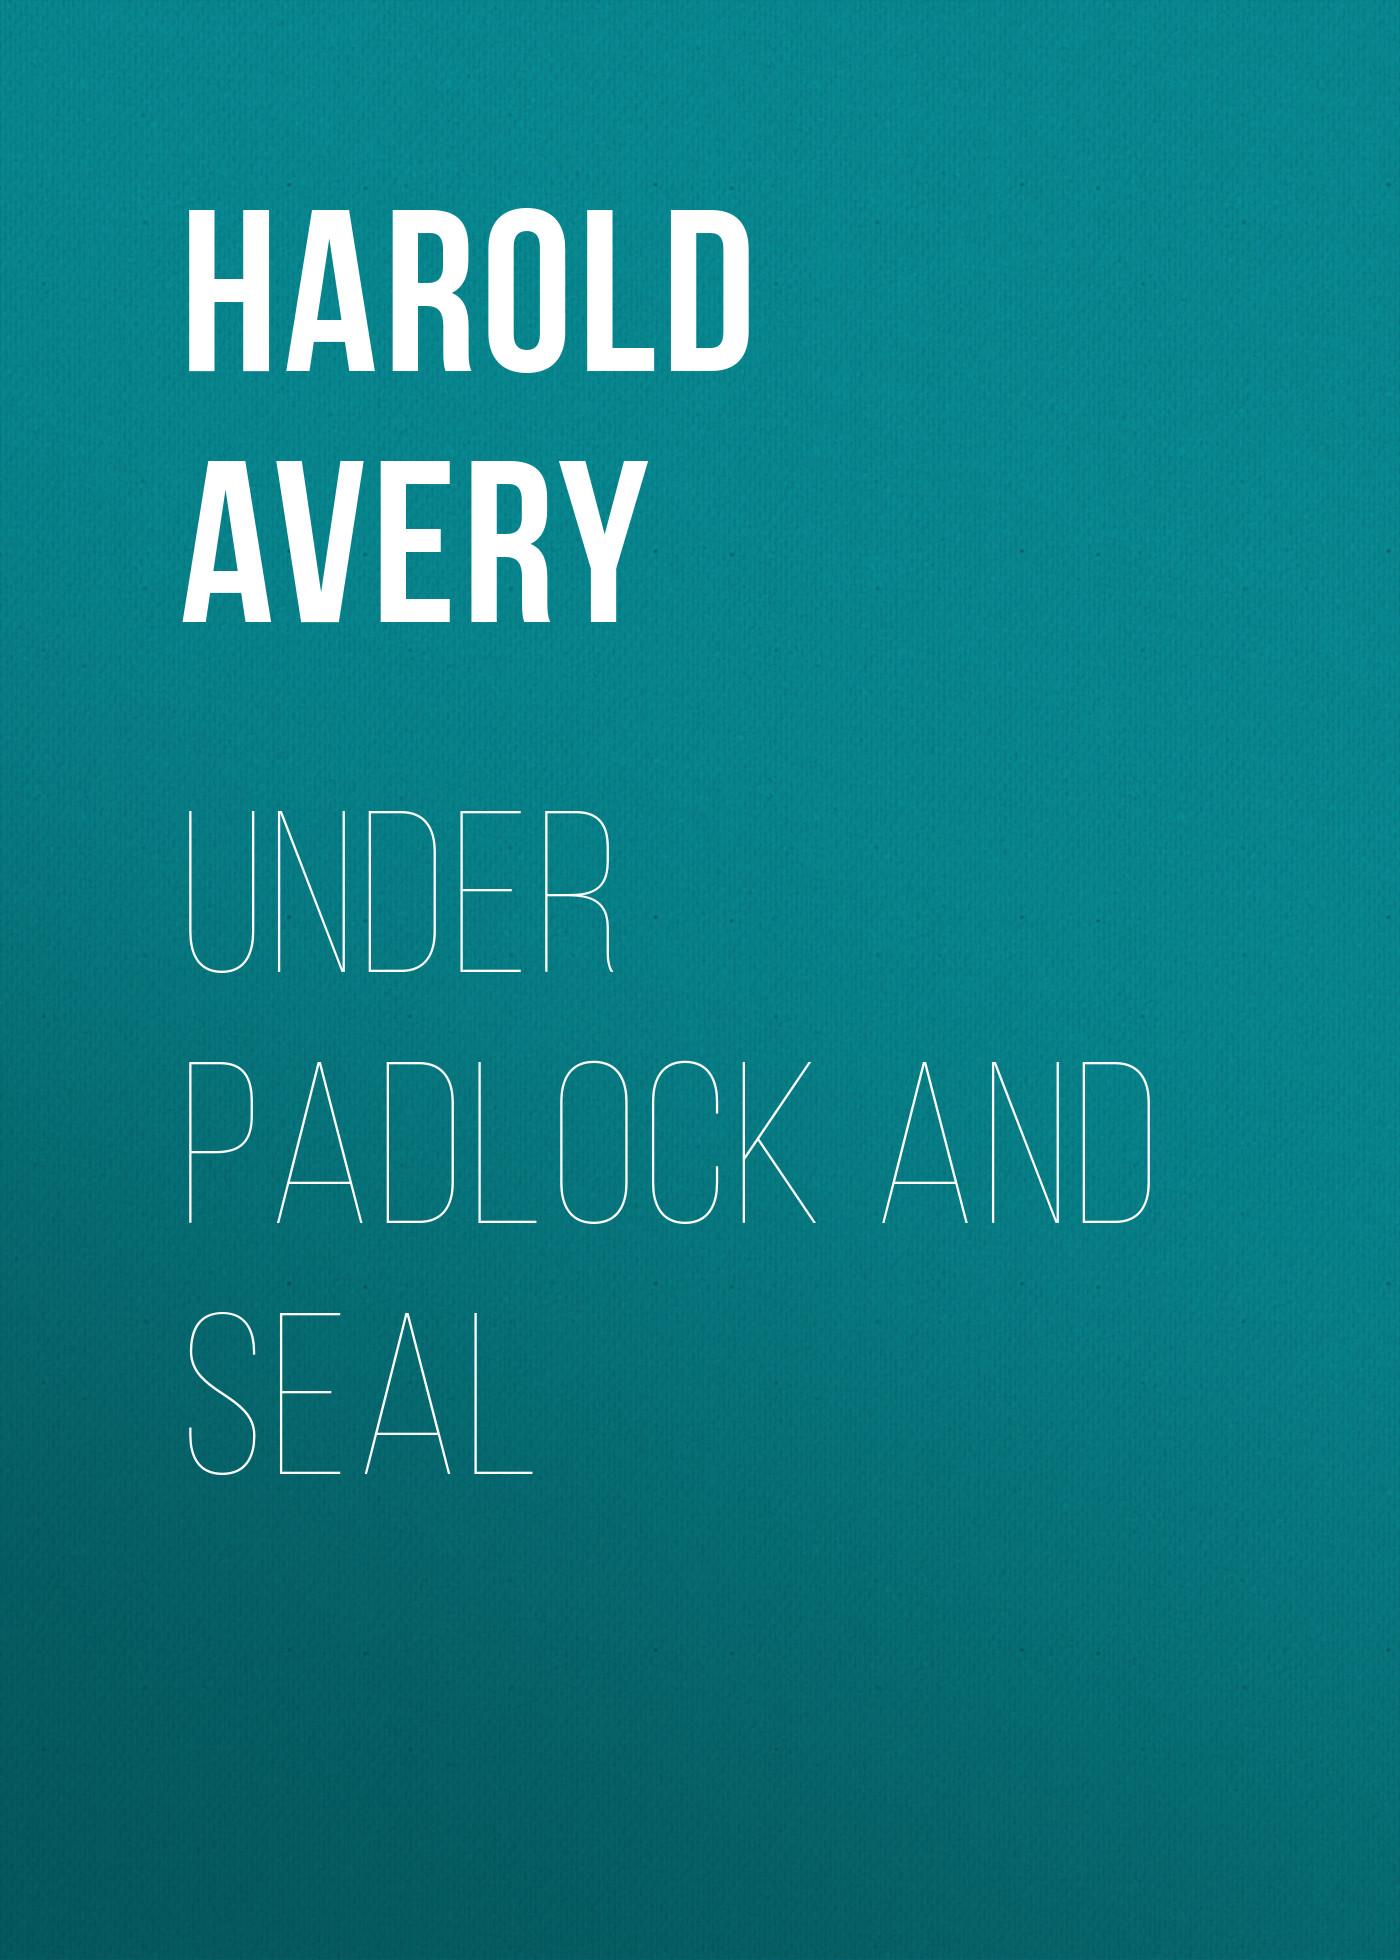 Under Padlock and Seal